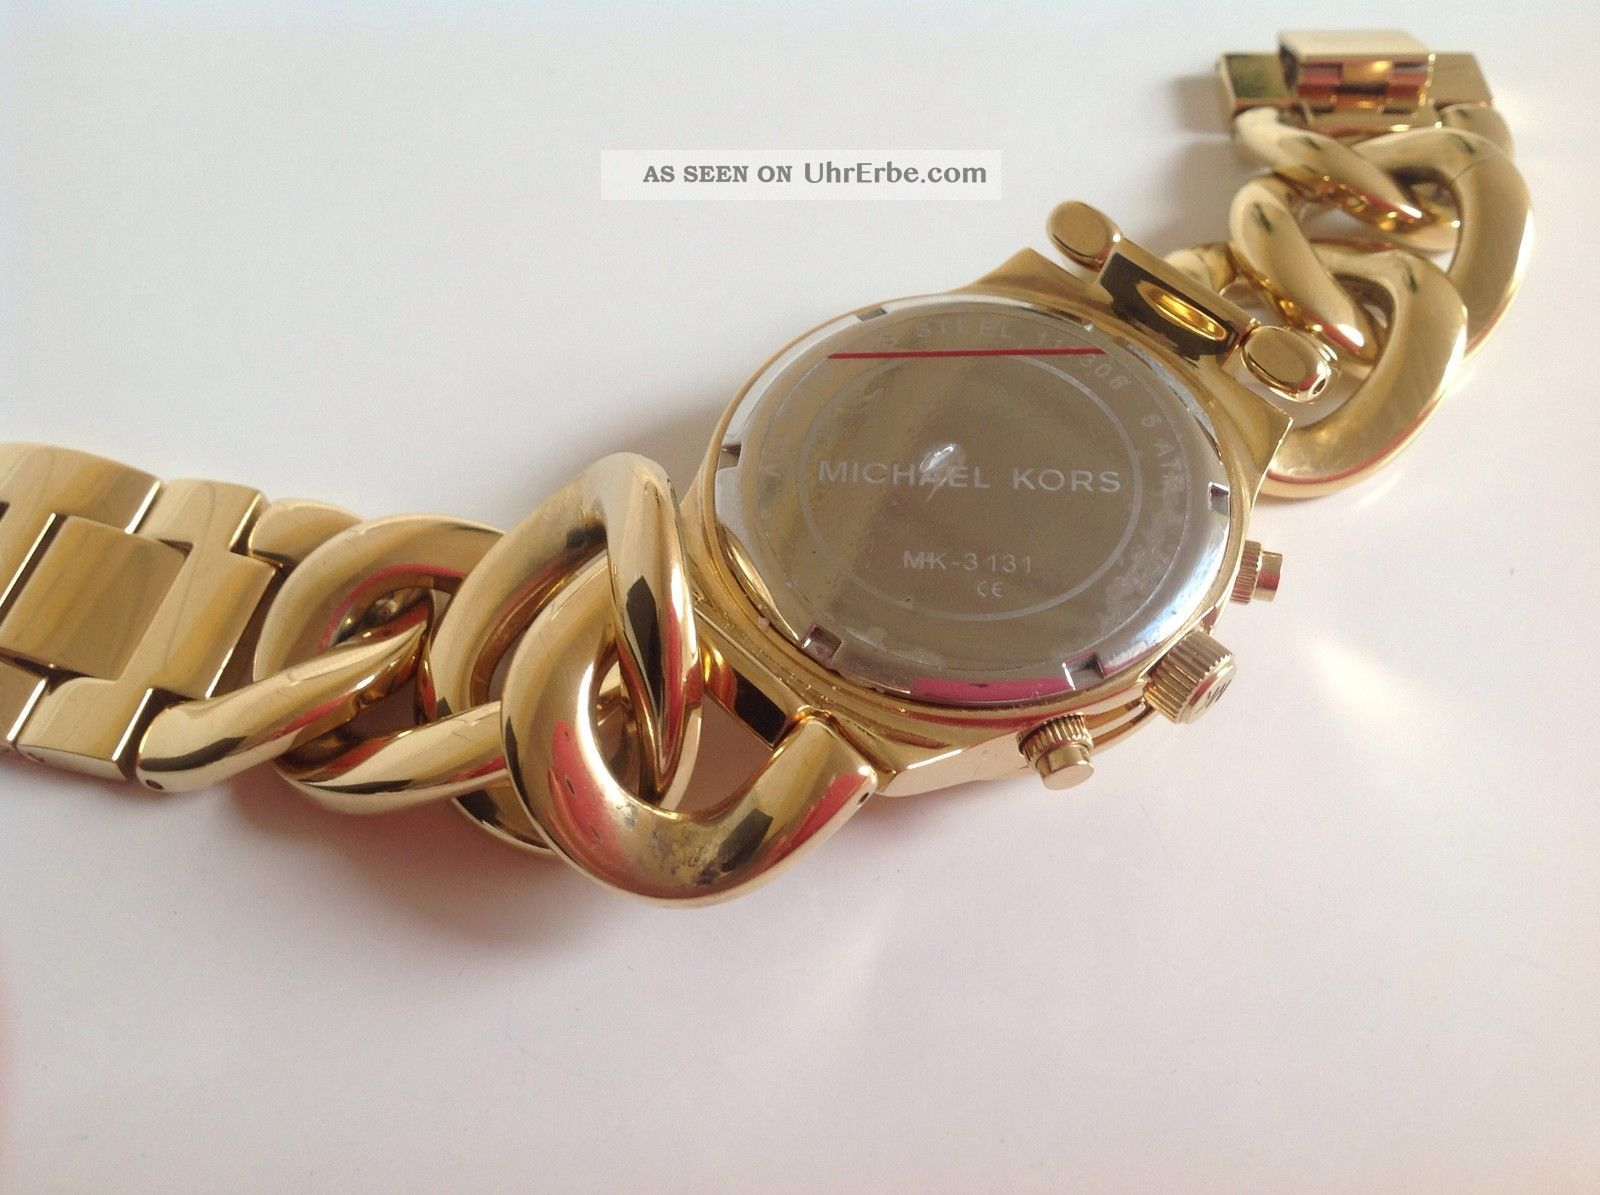 Michael Kors Damen Armbanduhr Chronograph Uhr Mk3131